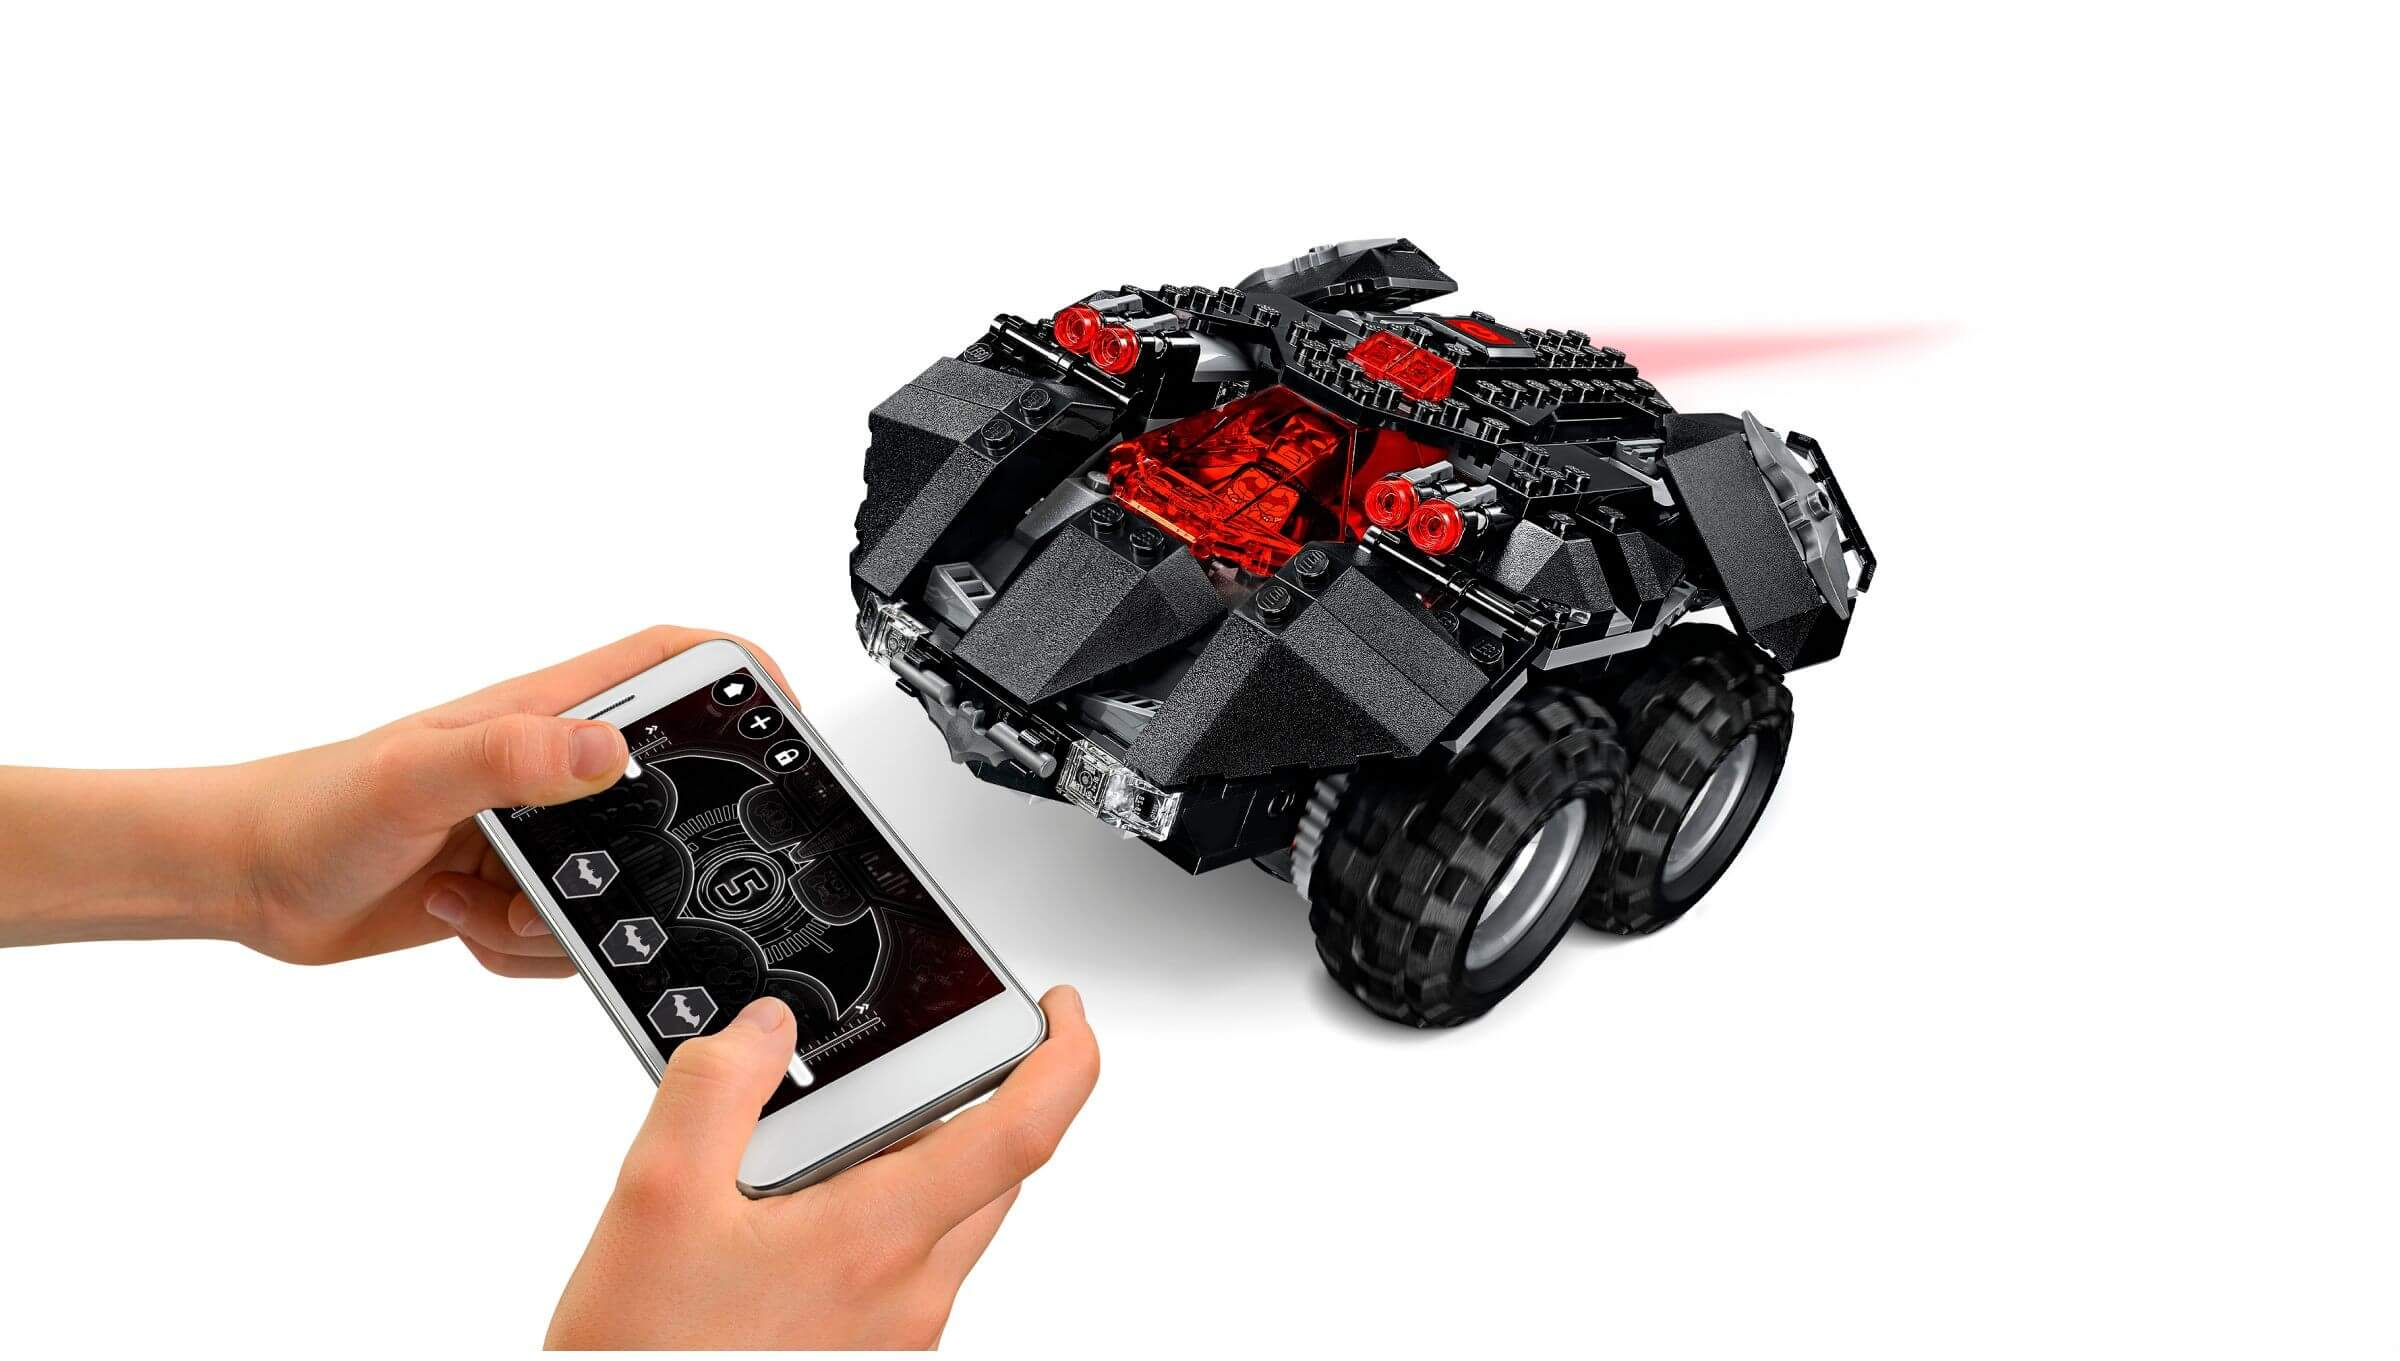 Mua đồ chơi LEGO 76112 - LEGO Super Heroes 76112 - Xe Batmobile Điều Khiển Từ Xa (LEGO 76112 App-Controlled Batmobile)